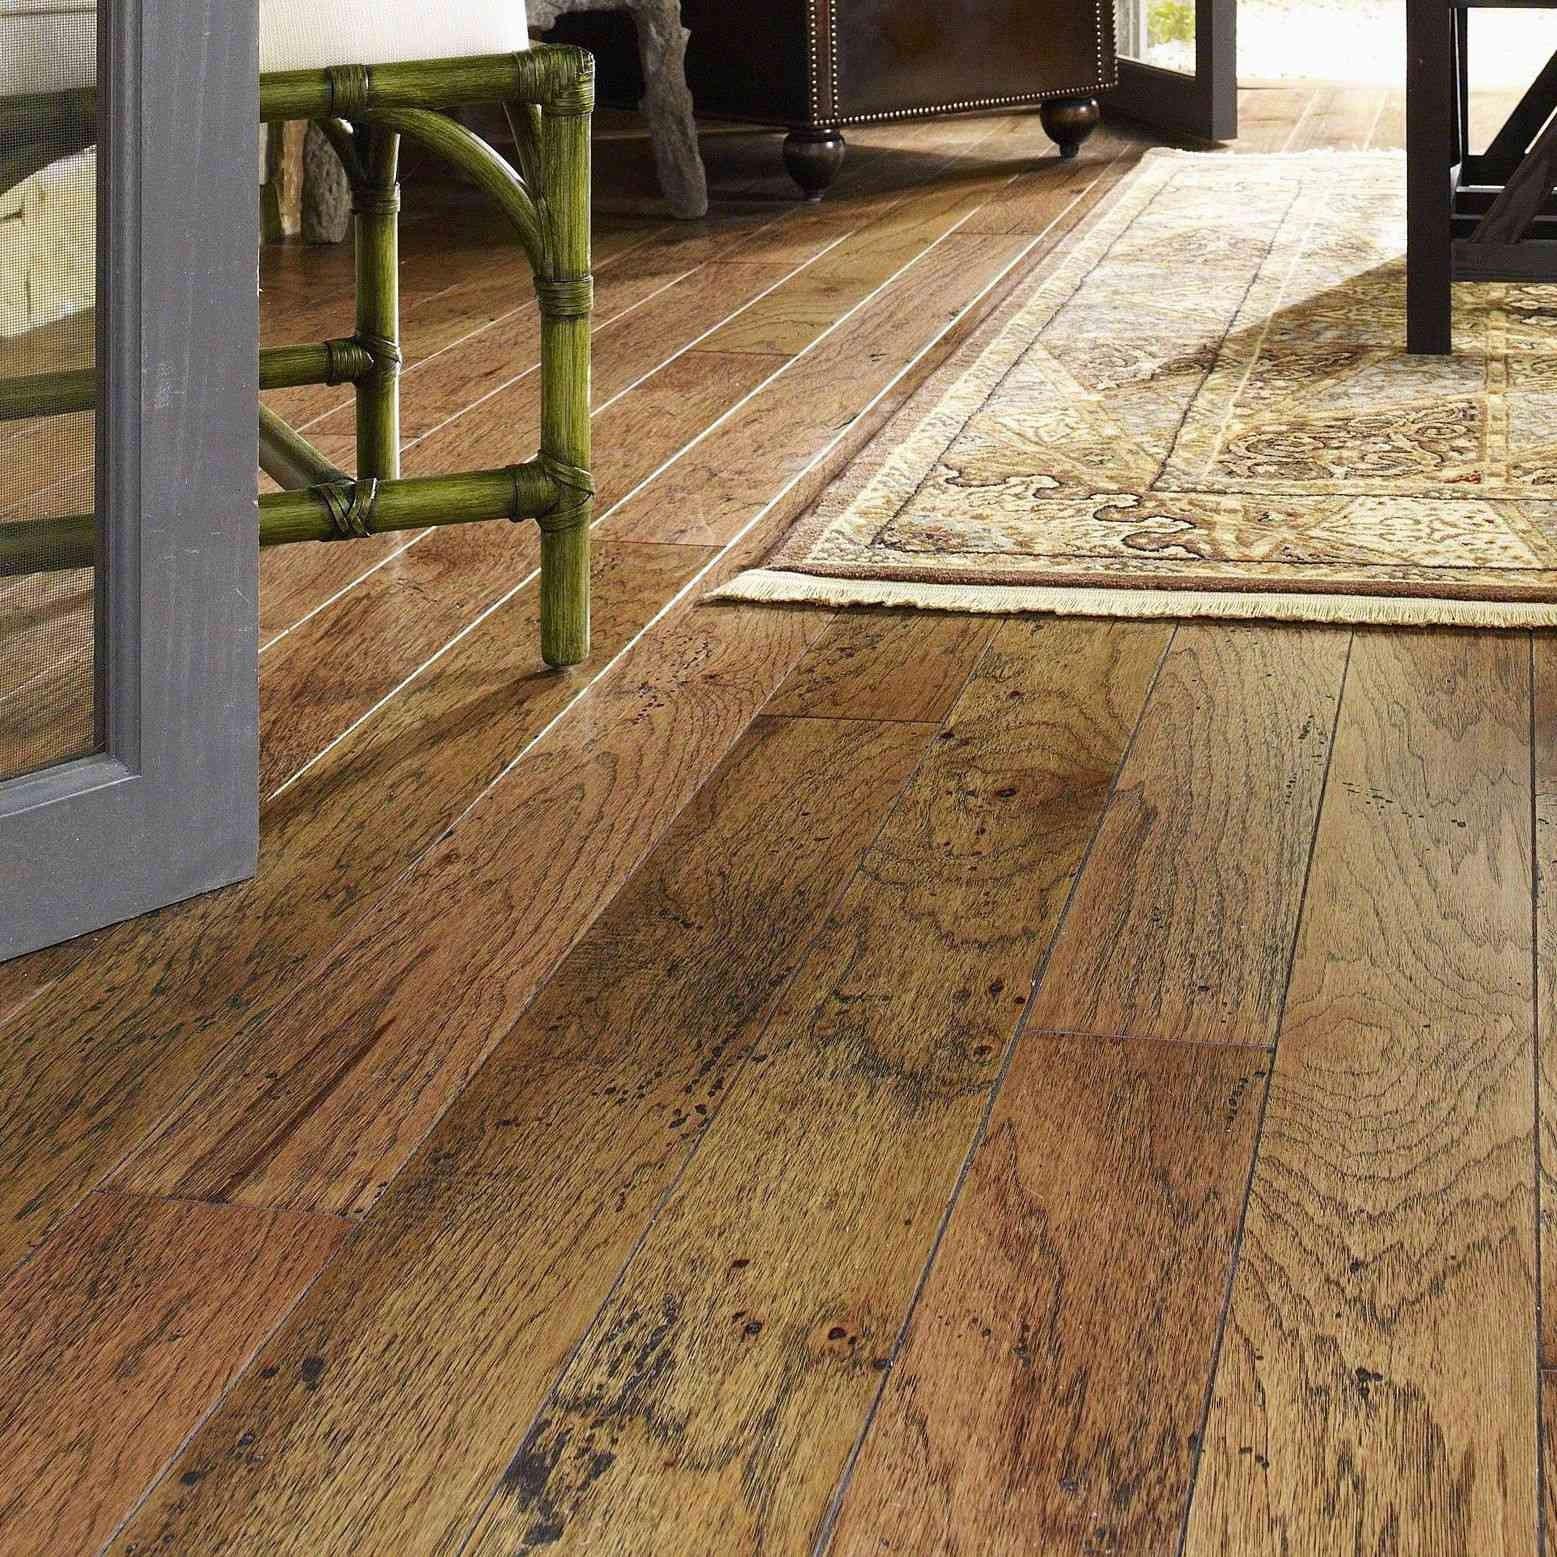 Cost to Refinish Hardwood Floors Los Angeles Of 15 Elegant How Much is Hardwood Flooring Pics Dizpos Com Intended for How Much is Hardwood Flooring Best Of Picture 27 Of 50 Hardwood Floor Designs New Best